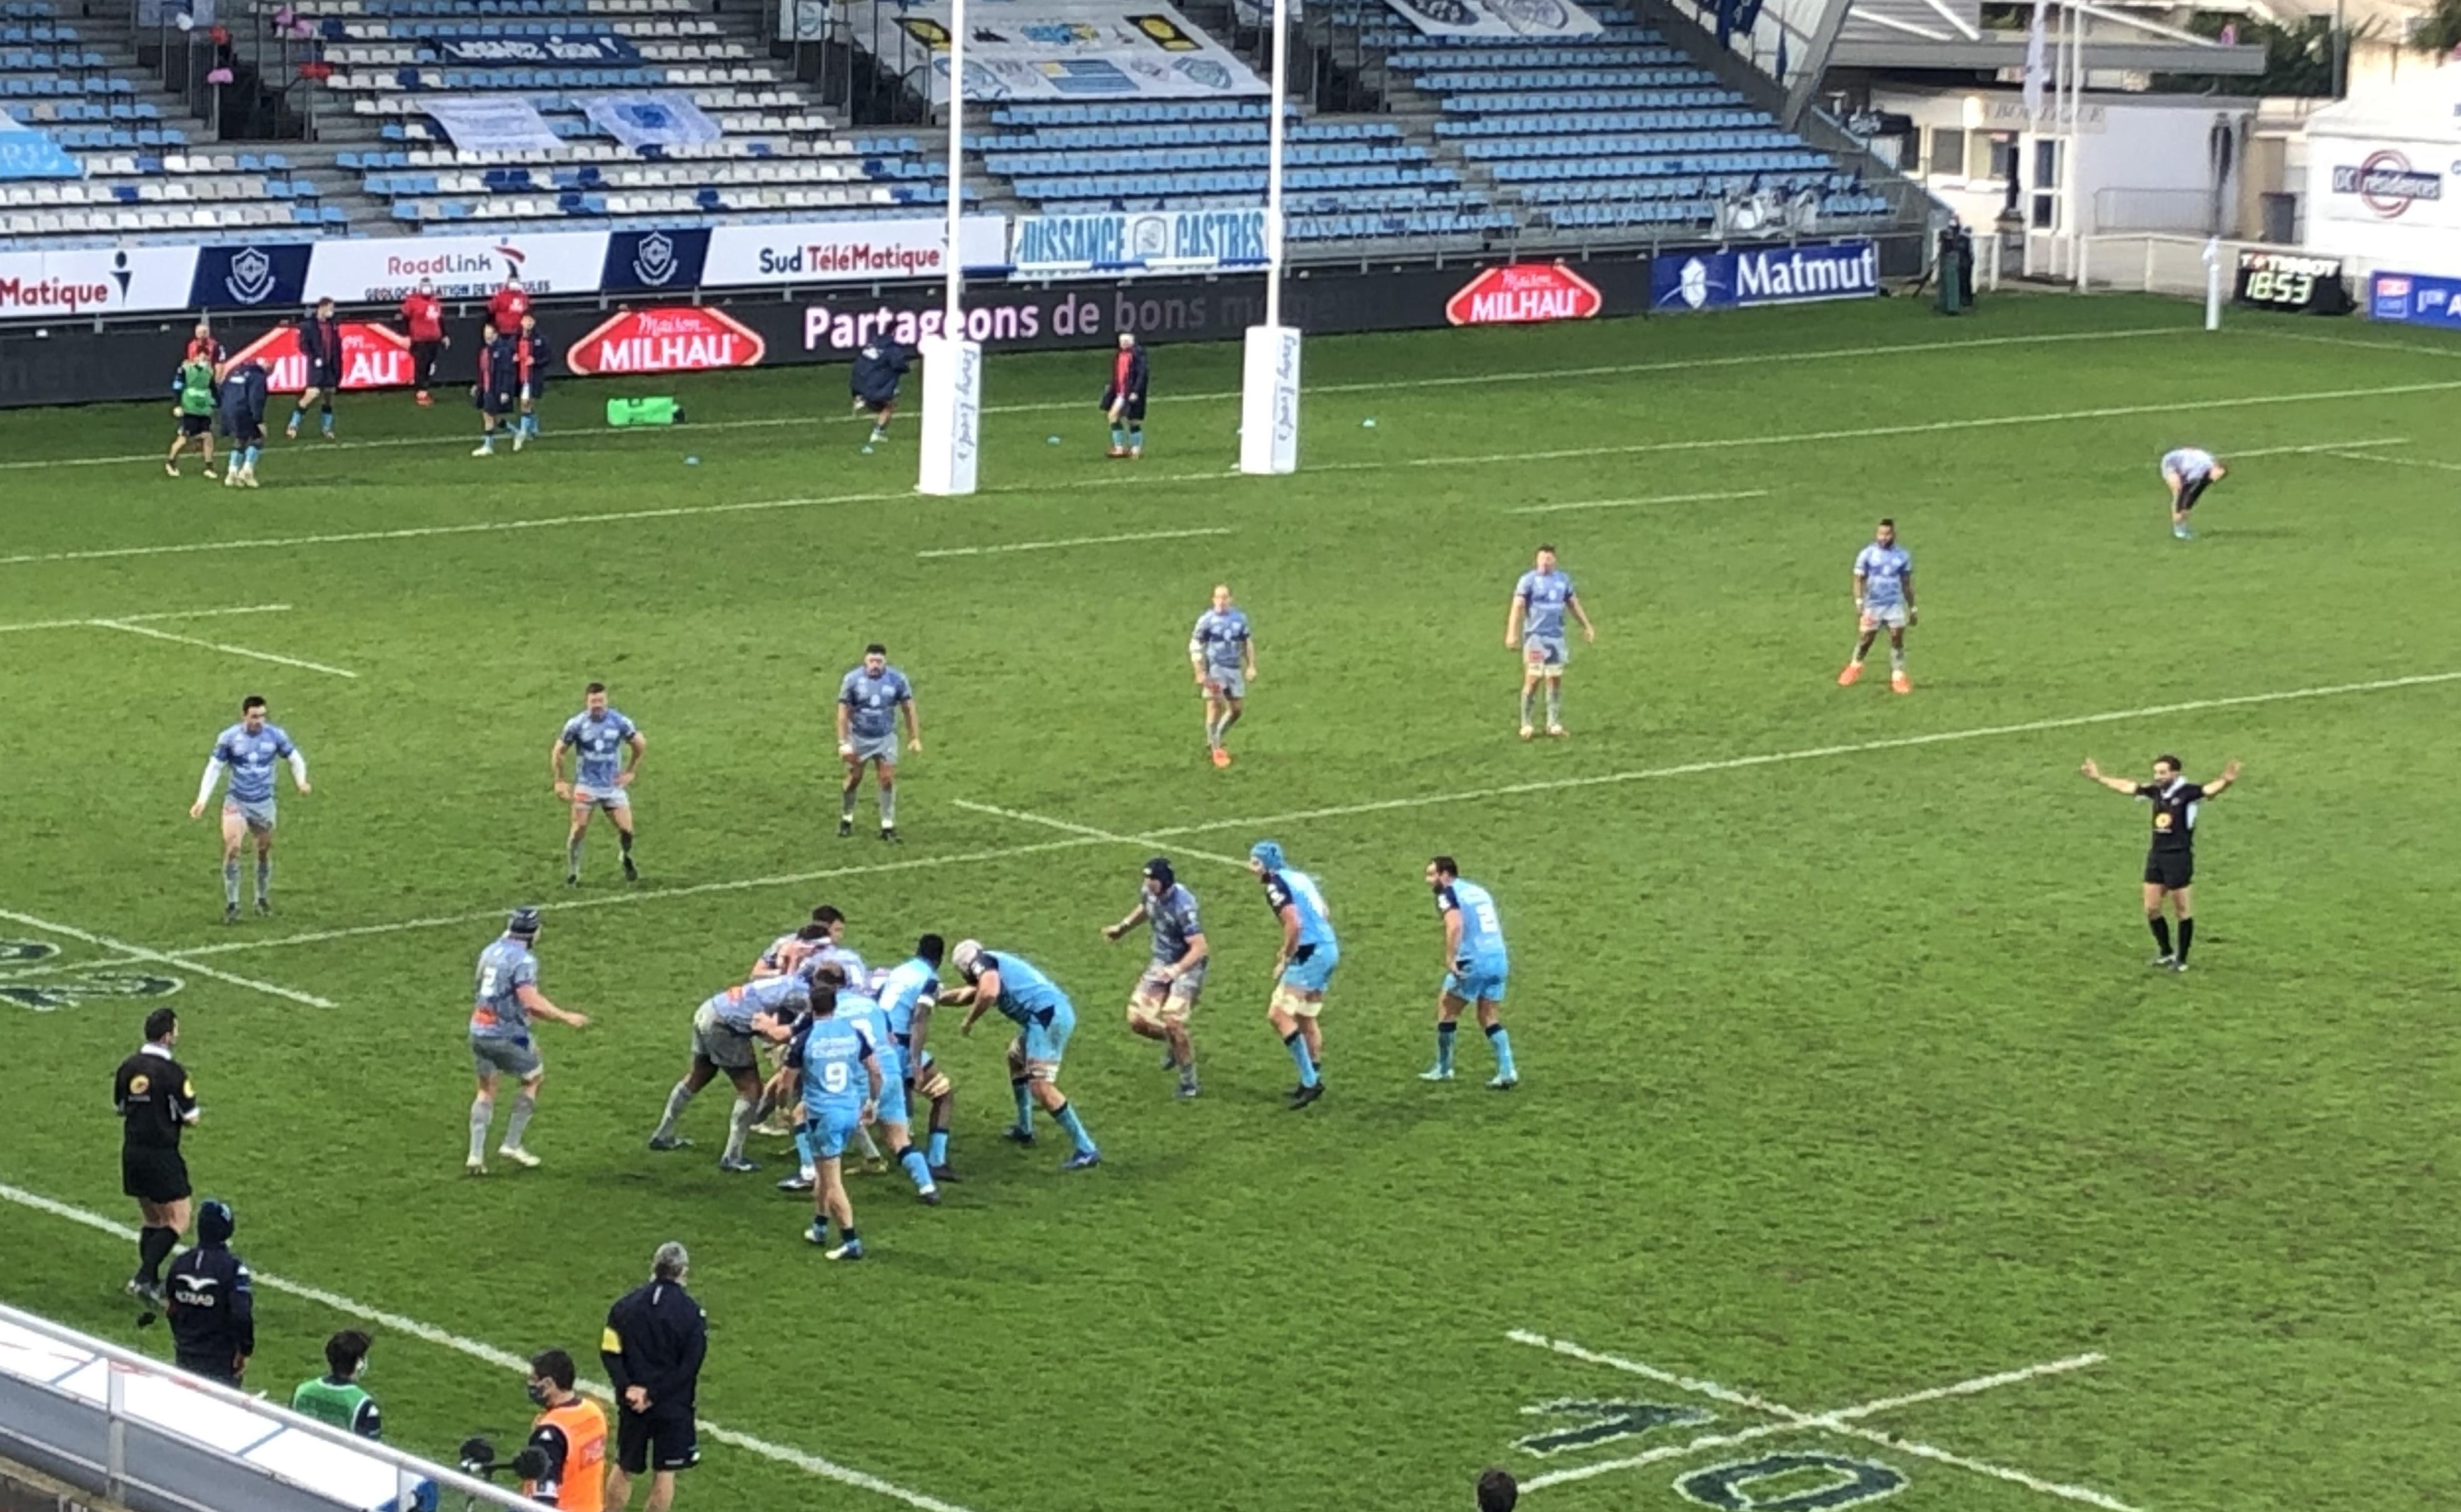 Rugby, Castres VS Montpellier - février 2021 ©CDS